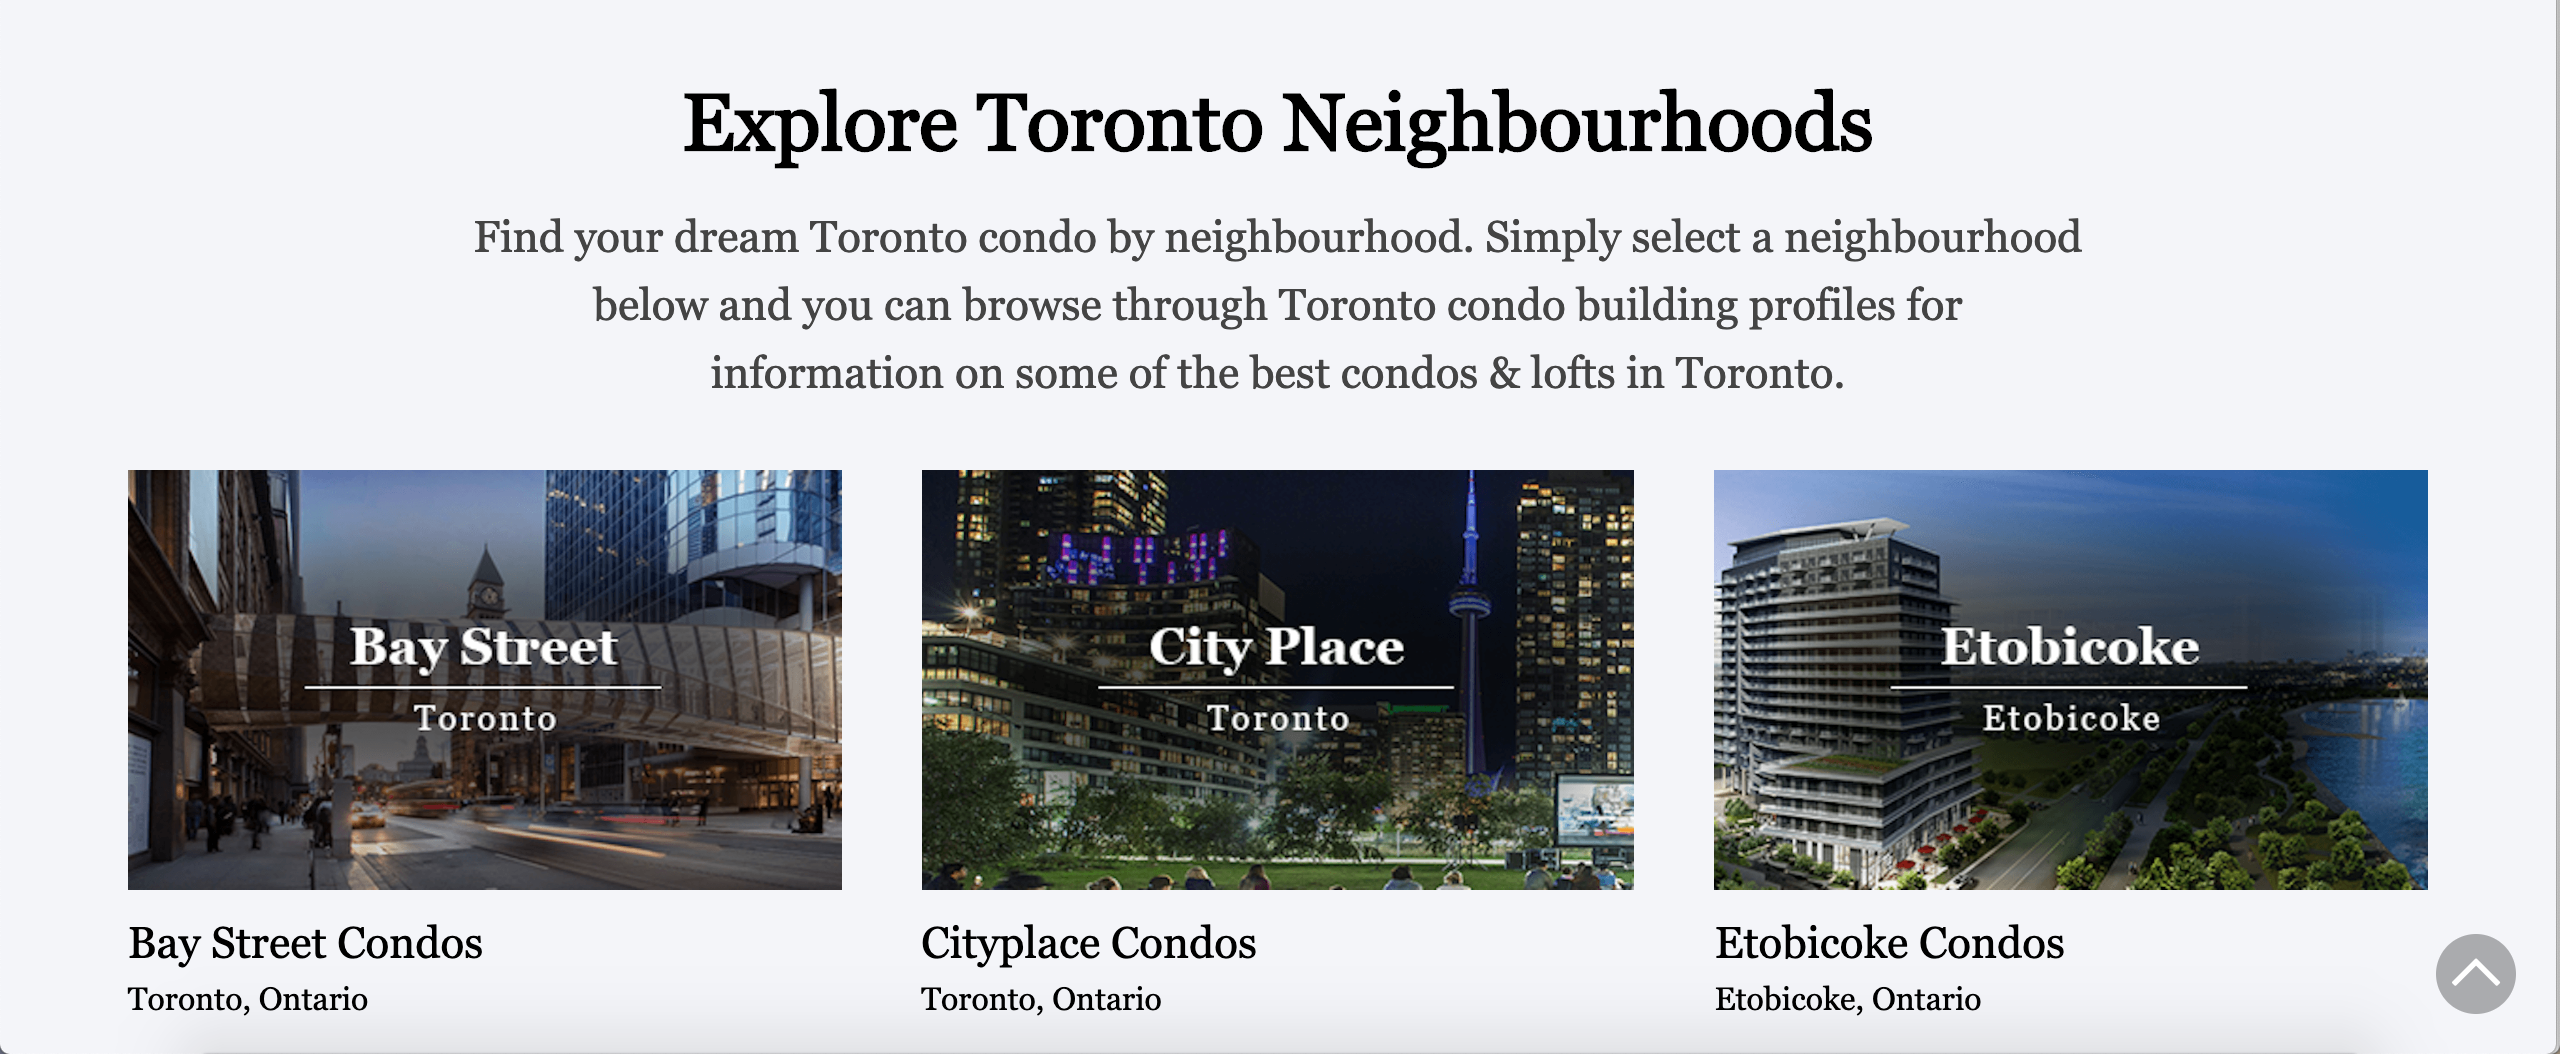 Top 5 Neighbourhoods To Live In Downtown Toronto